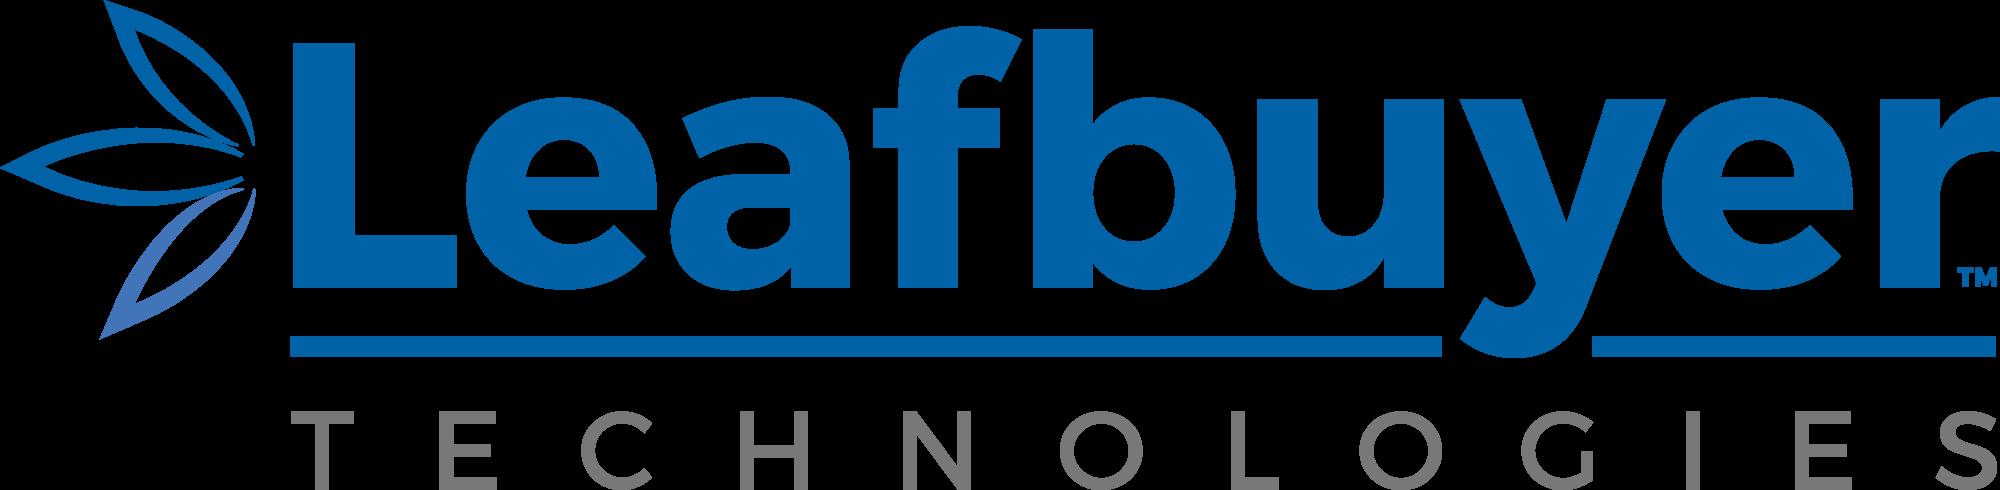 Leafbuyer Technologies Inc.